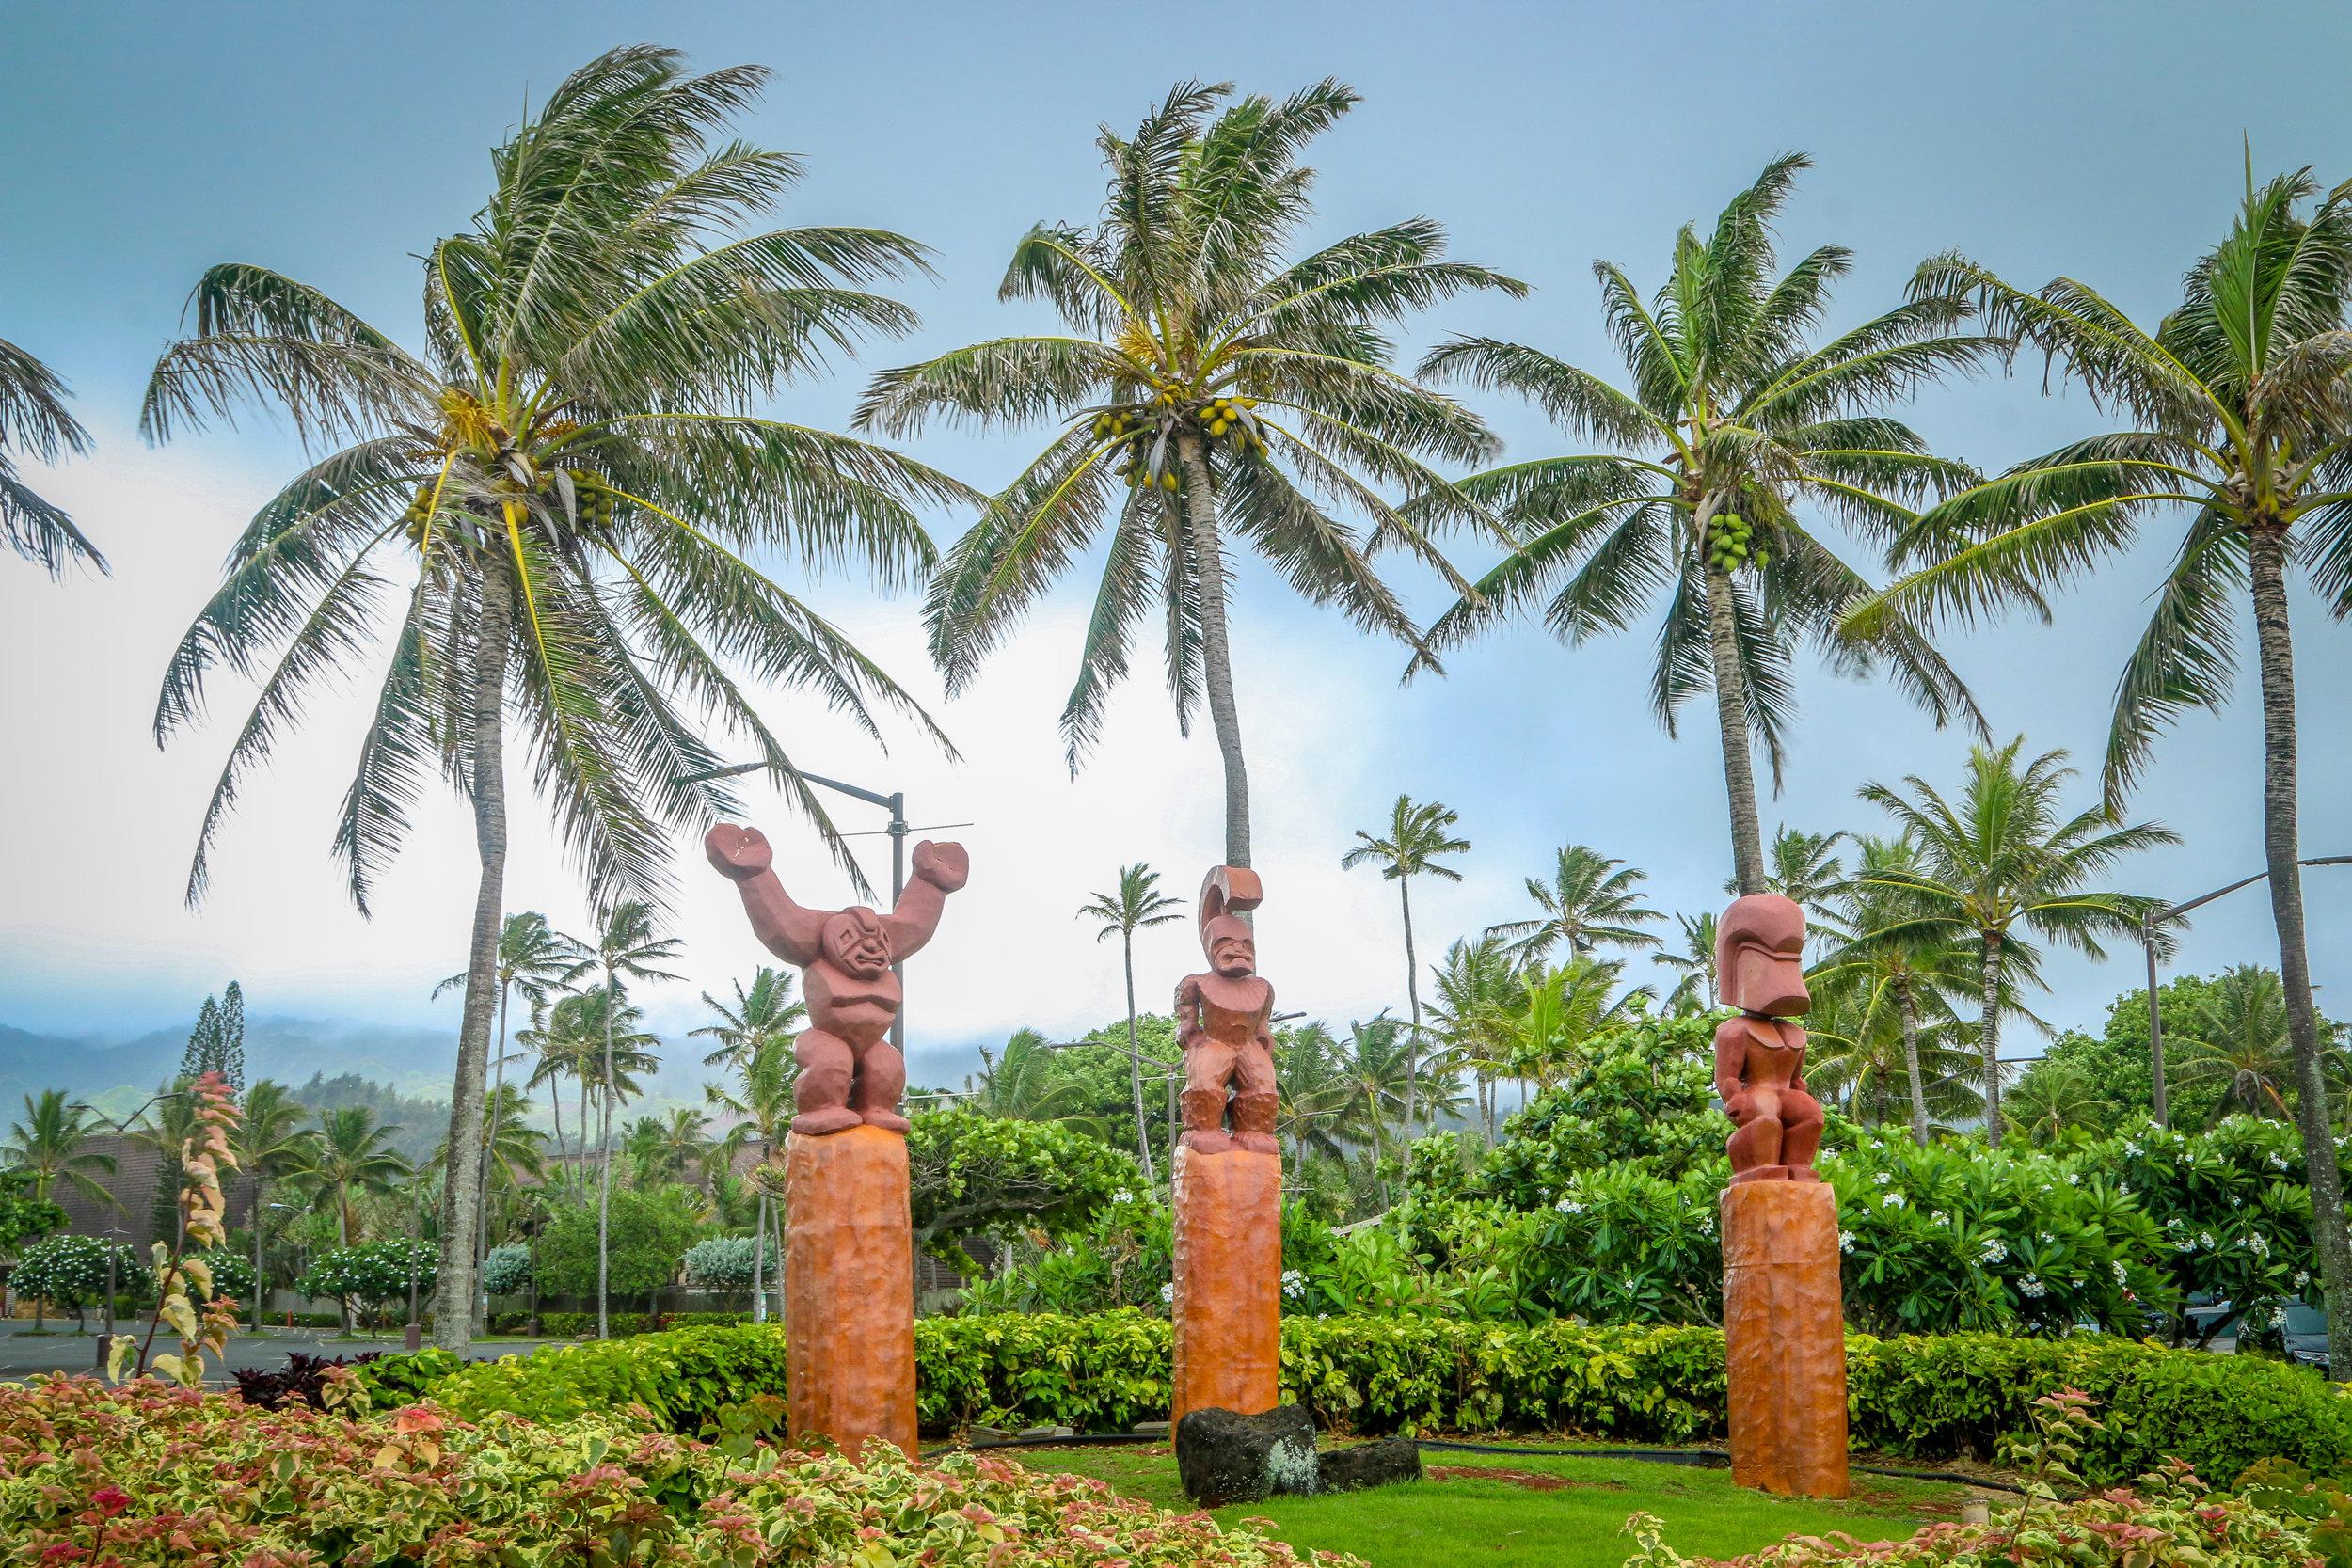 Oahu Hawaii HI photos photography